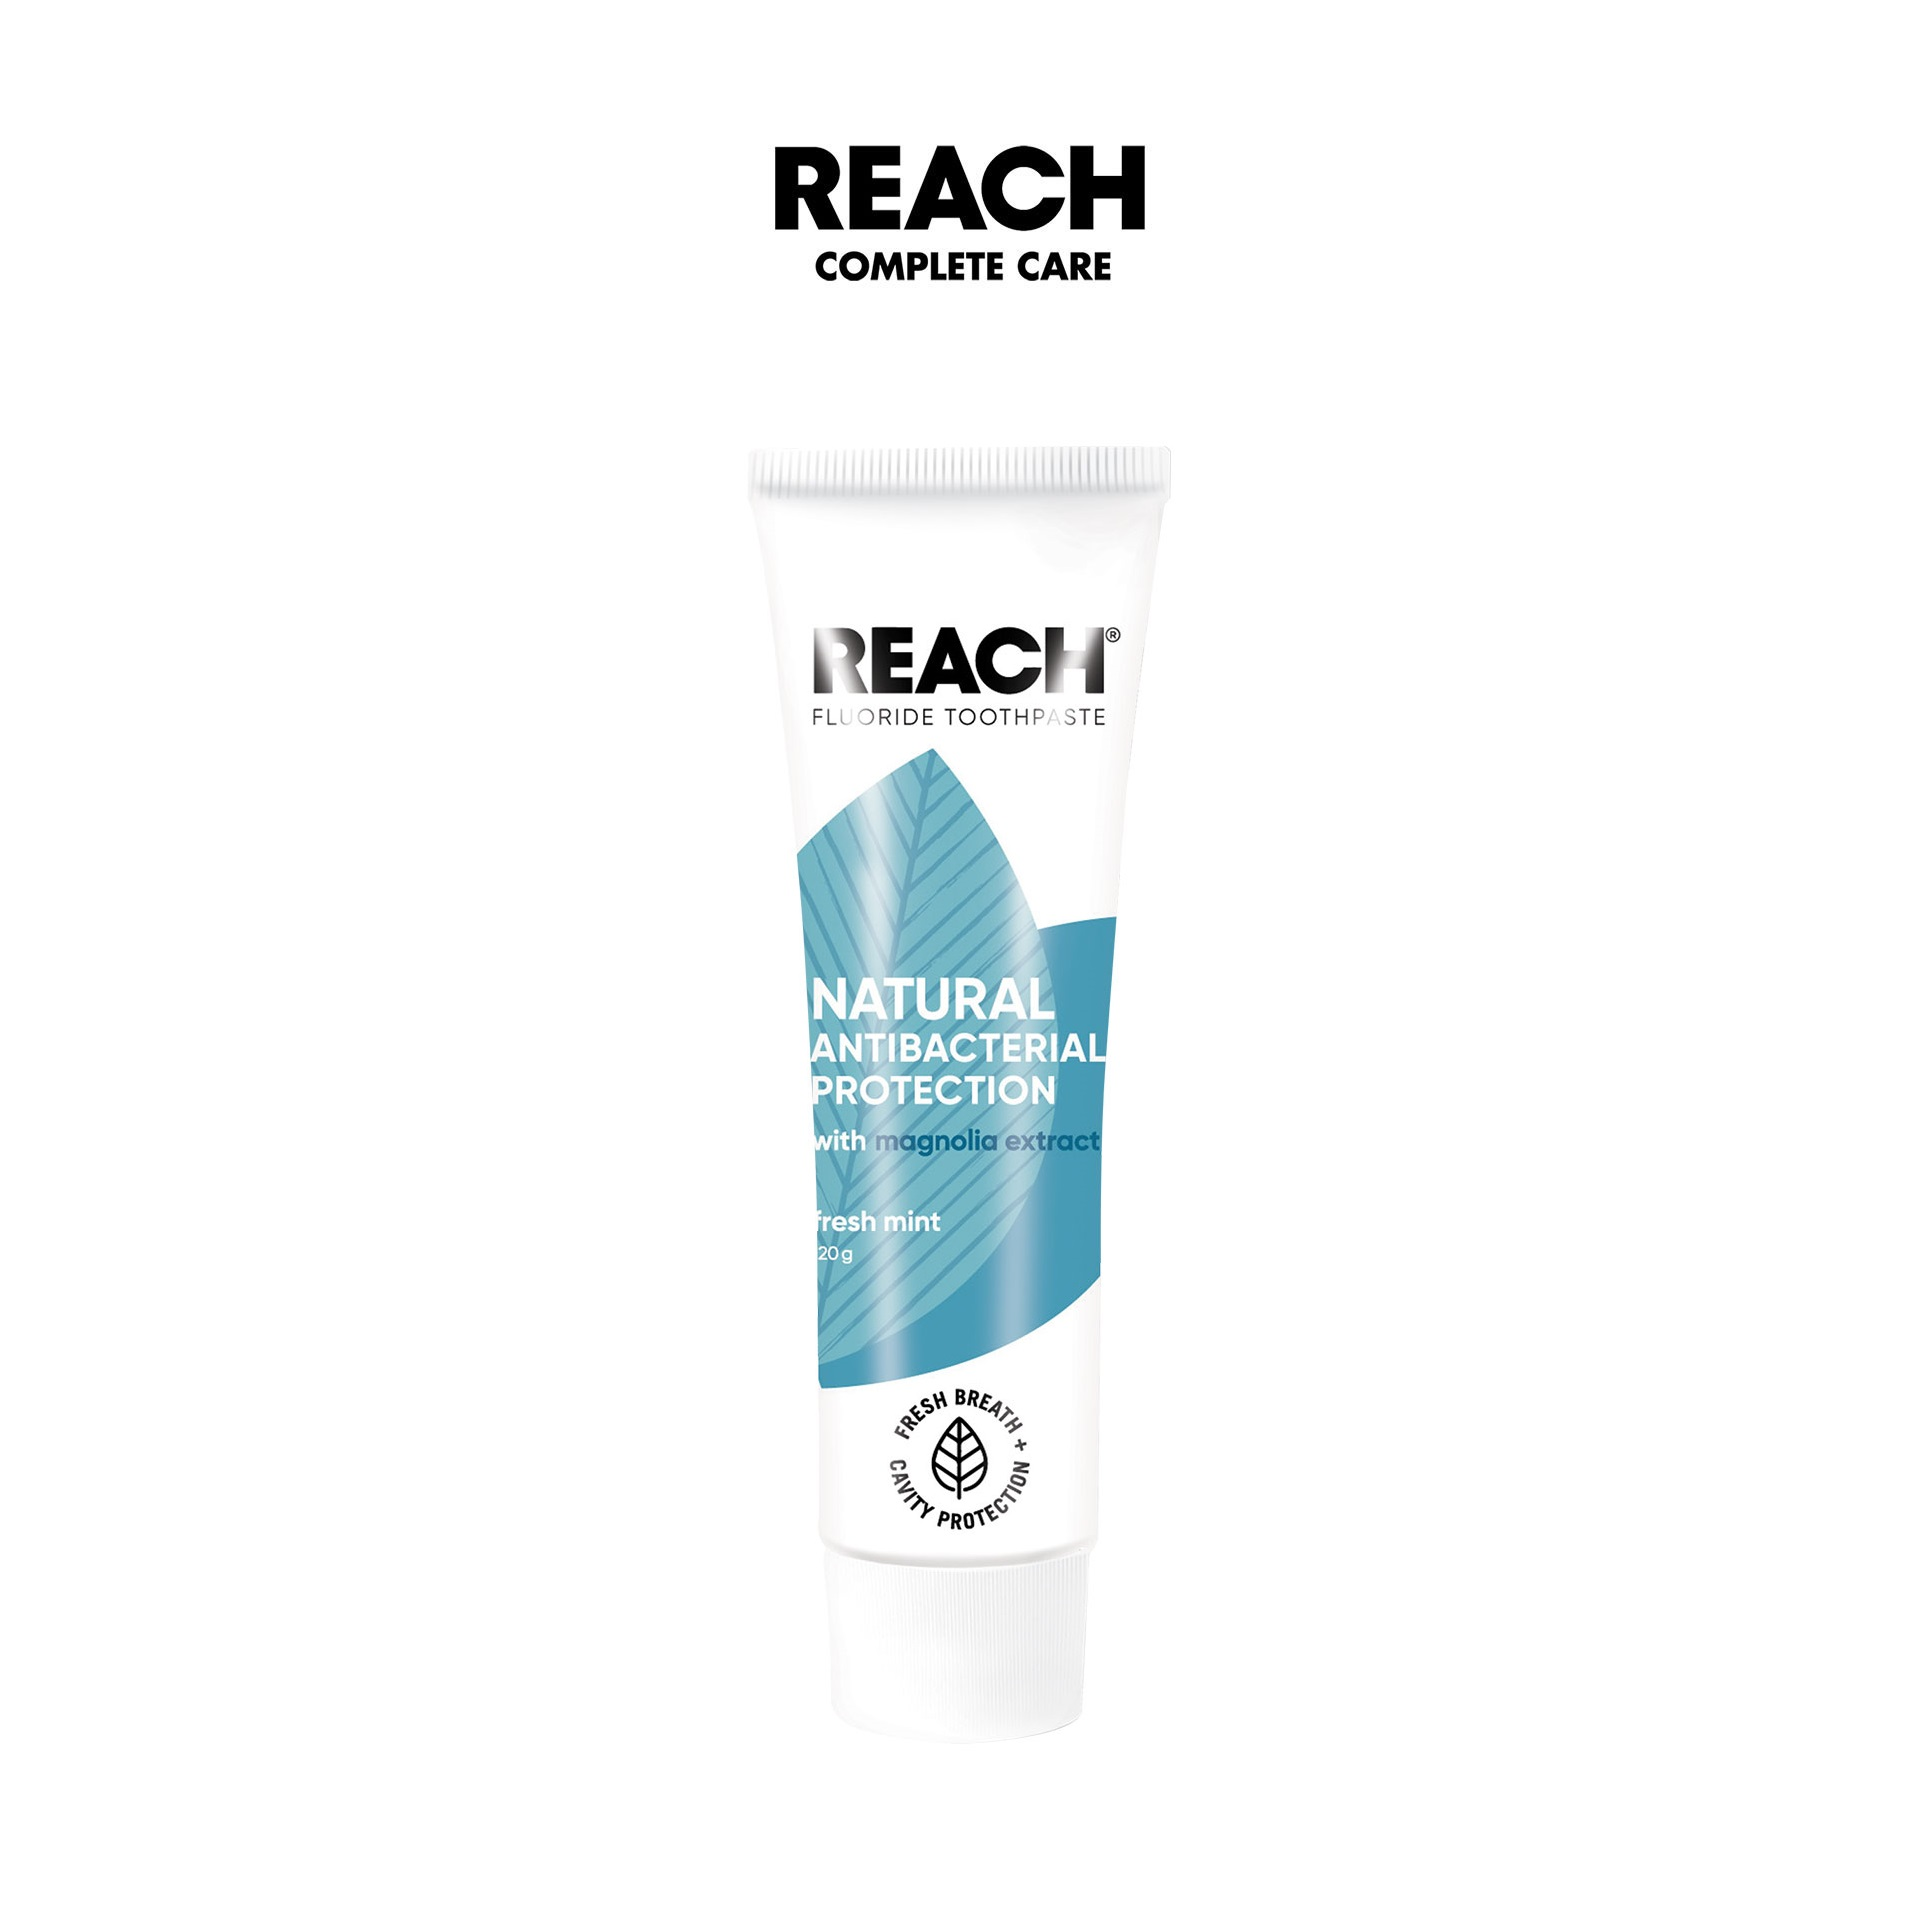 Kem đánh răng kháng khuẩn Reach Flouride Fresh Mint 120gr - Hương Sảng Khoái